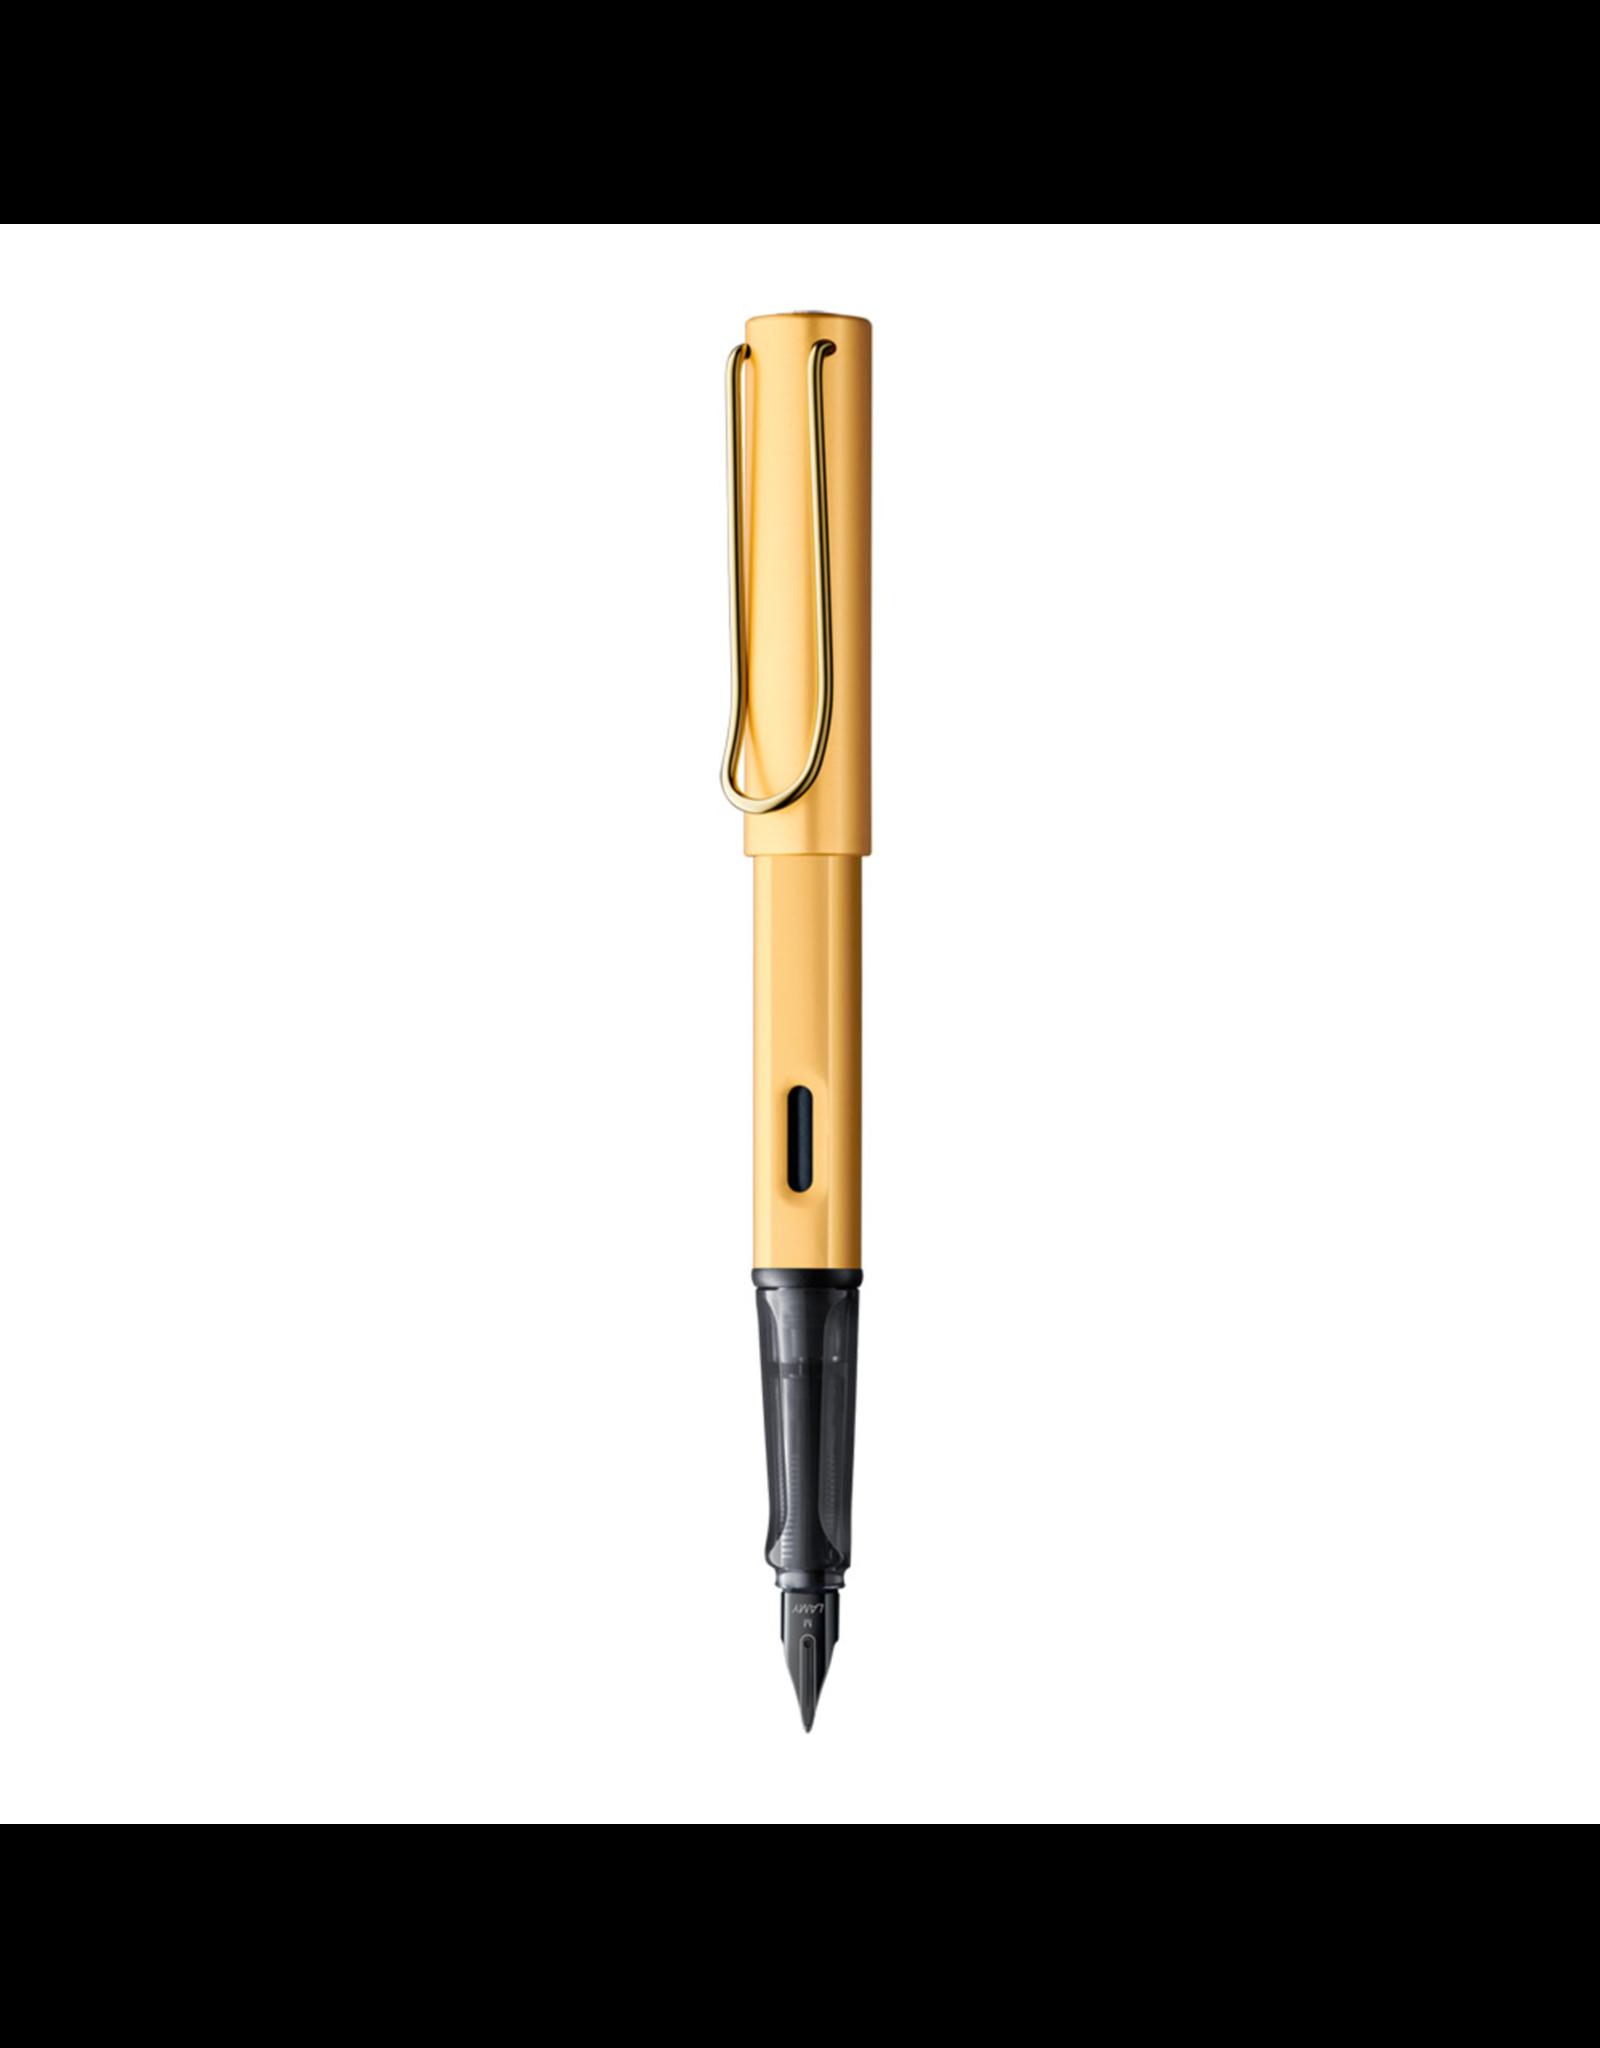 LAMY Lx Fountain Pen, Gold, Medium Nib